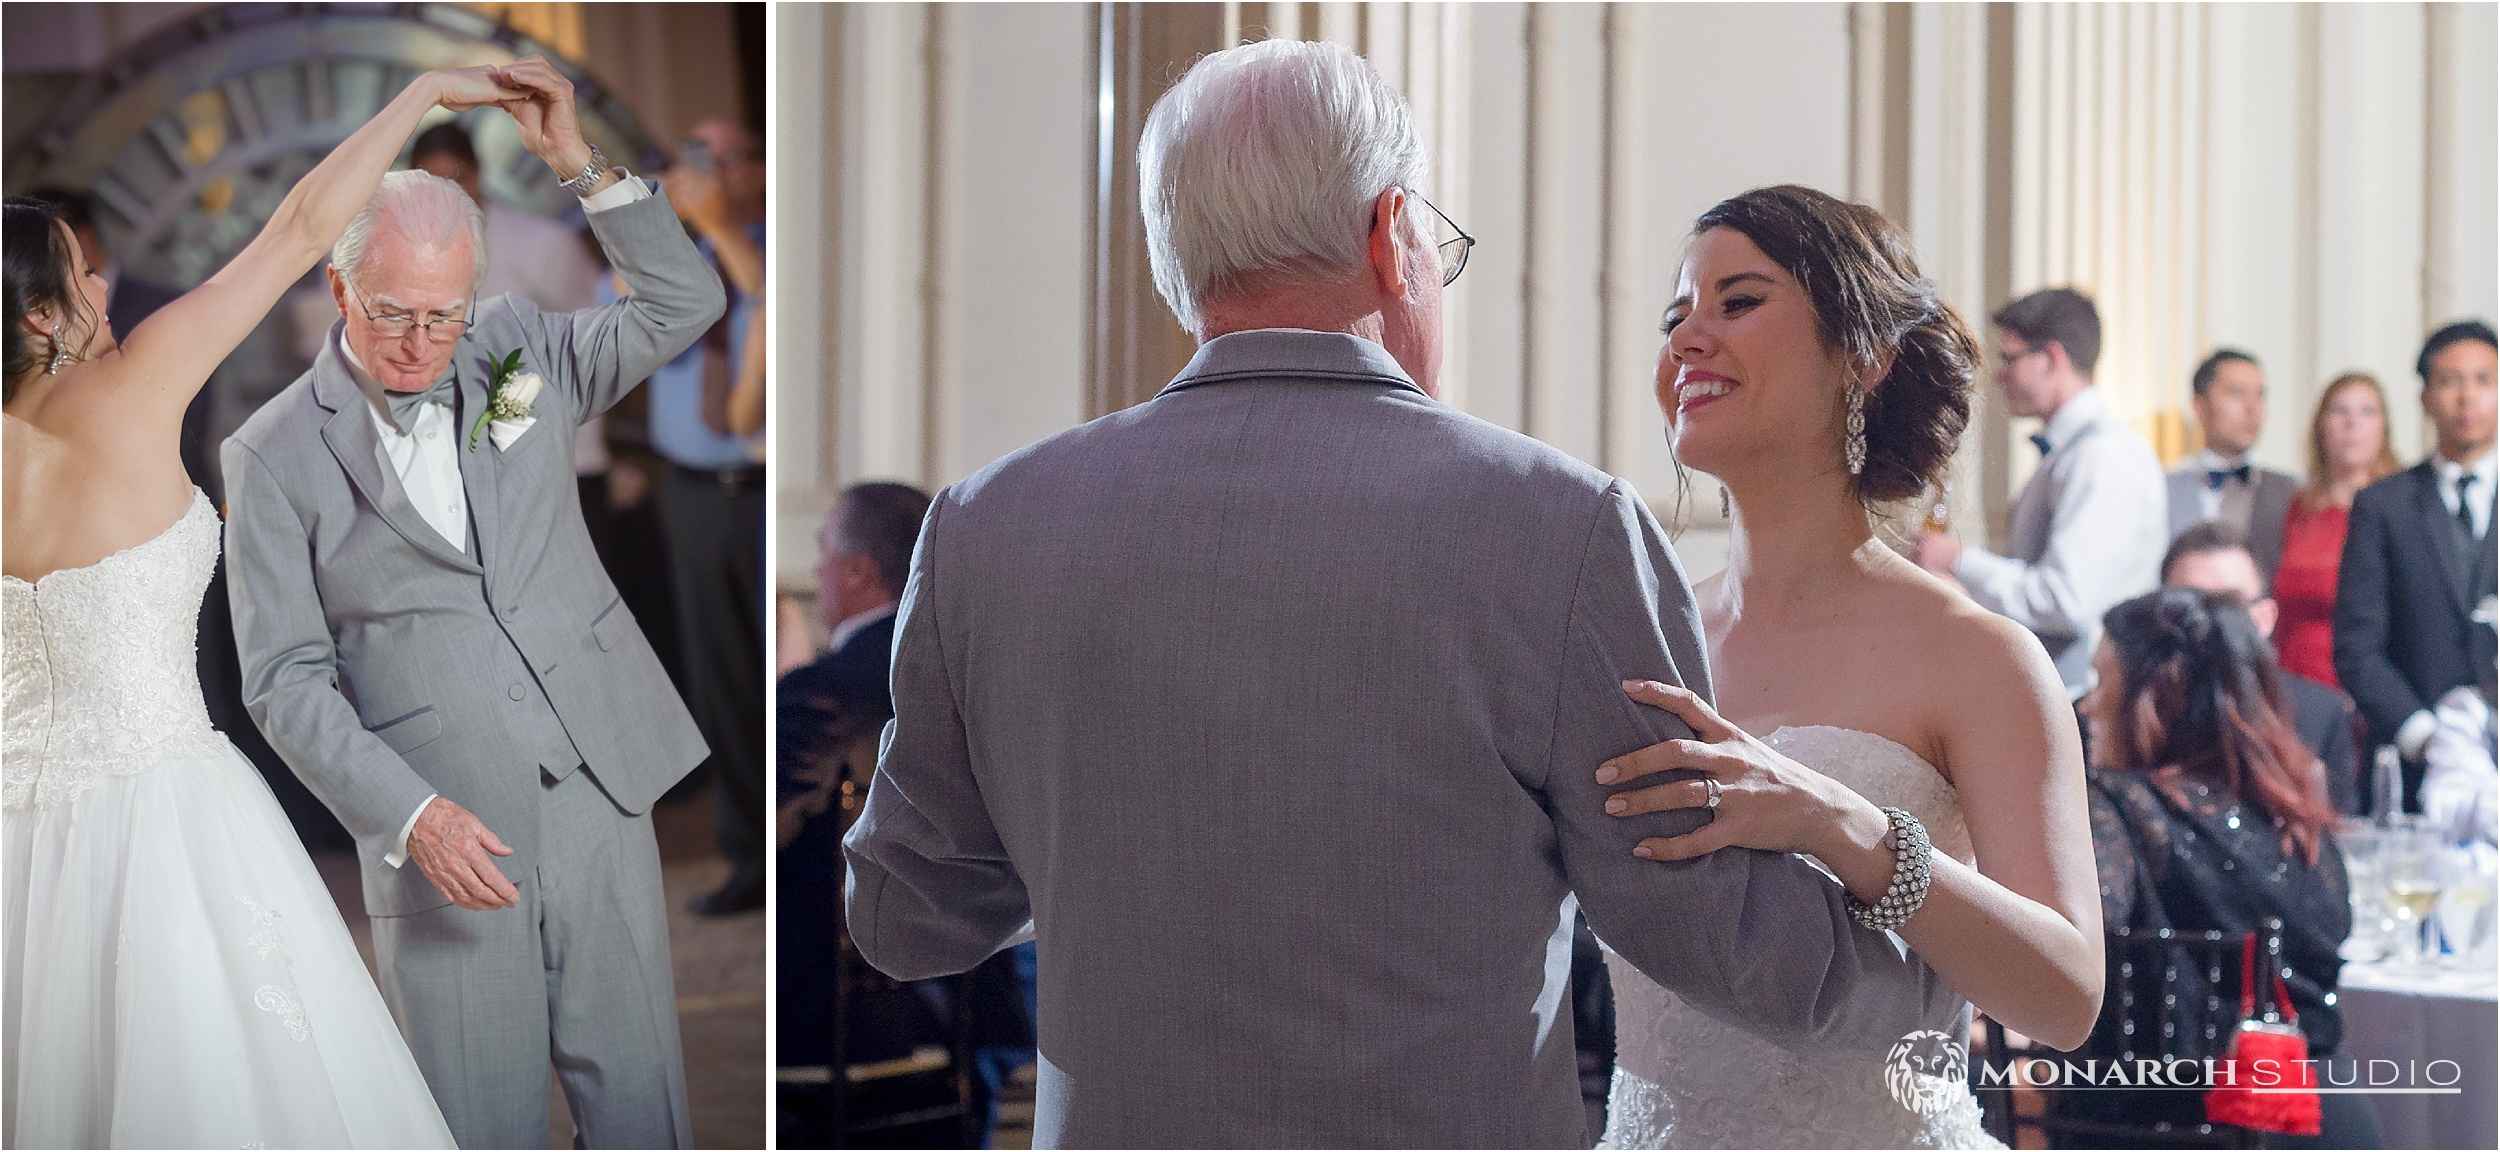 wedding-photographer-in-st-augustine-florida-treasury-106.jpg